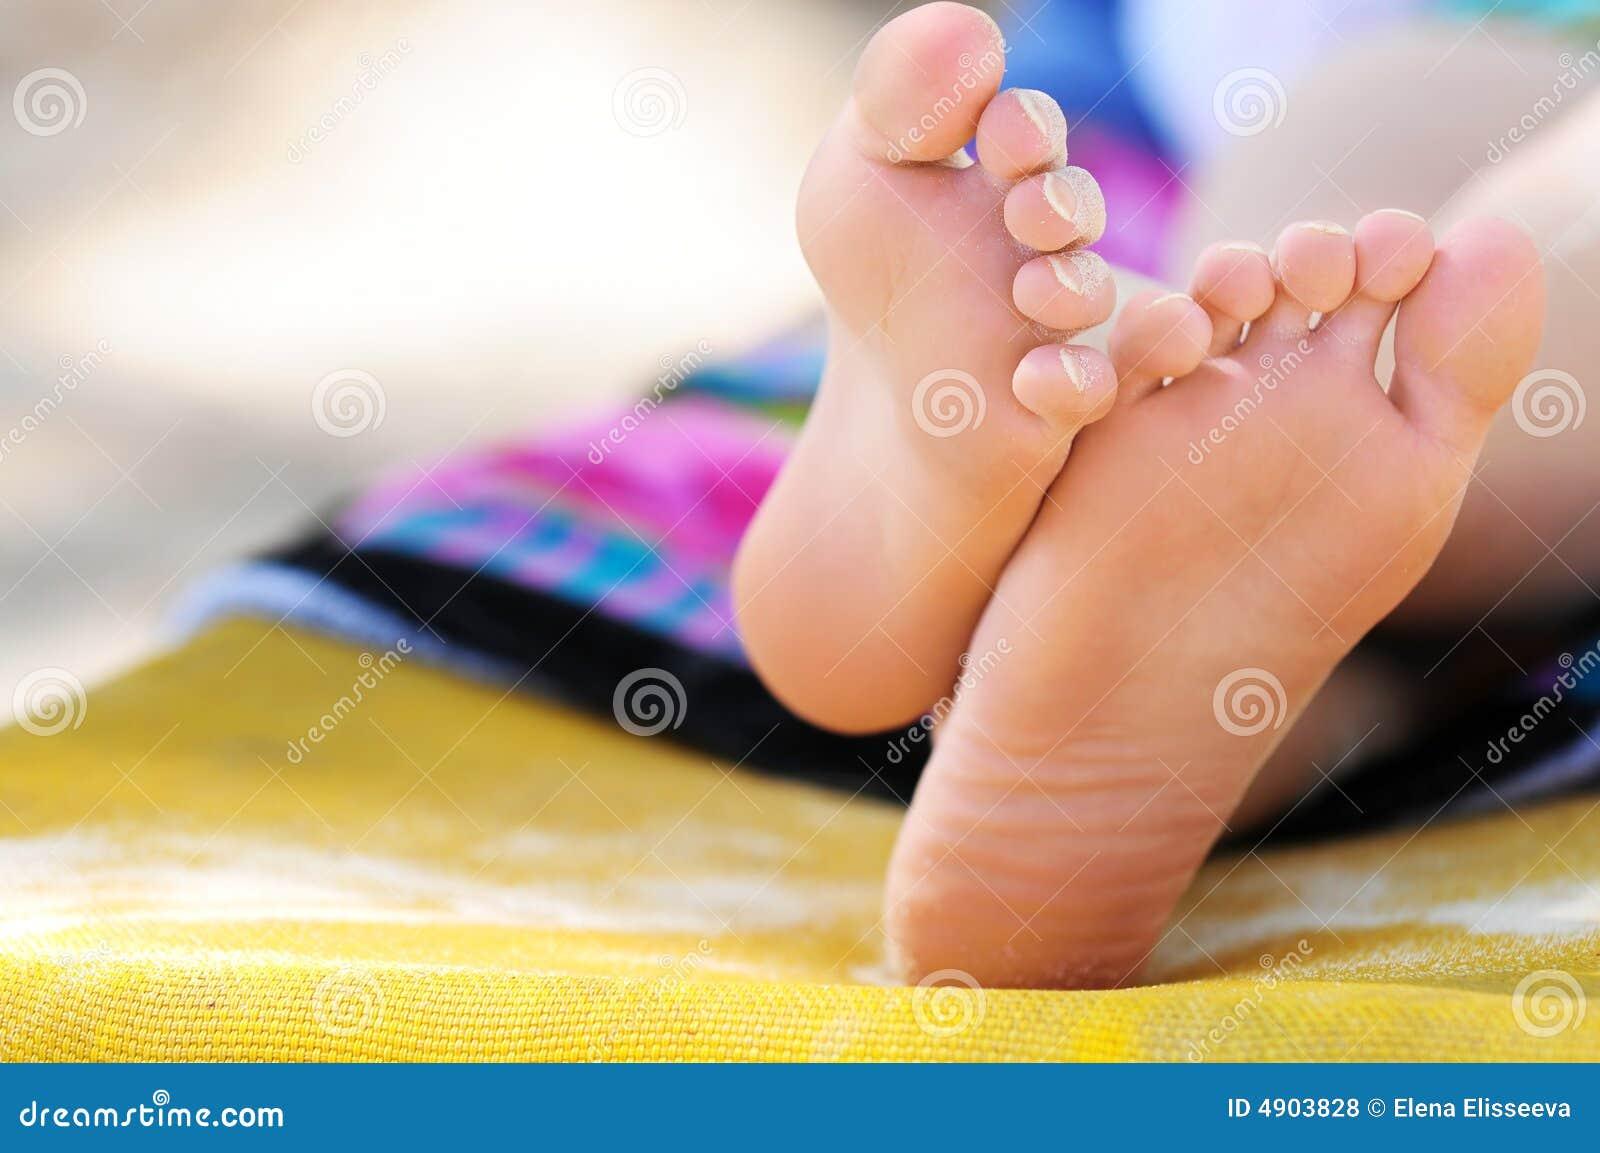 Free young feet pics